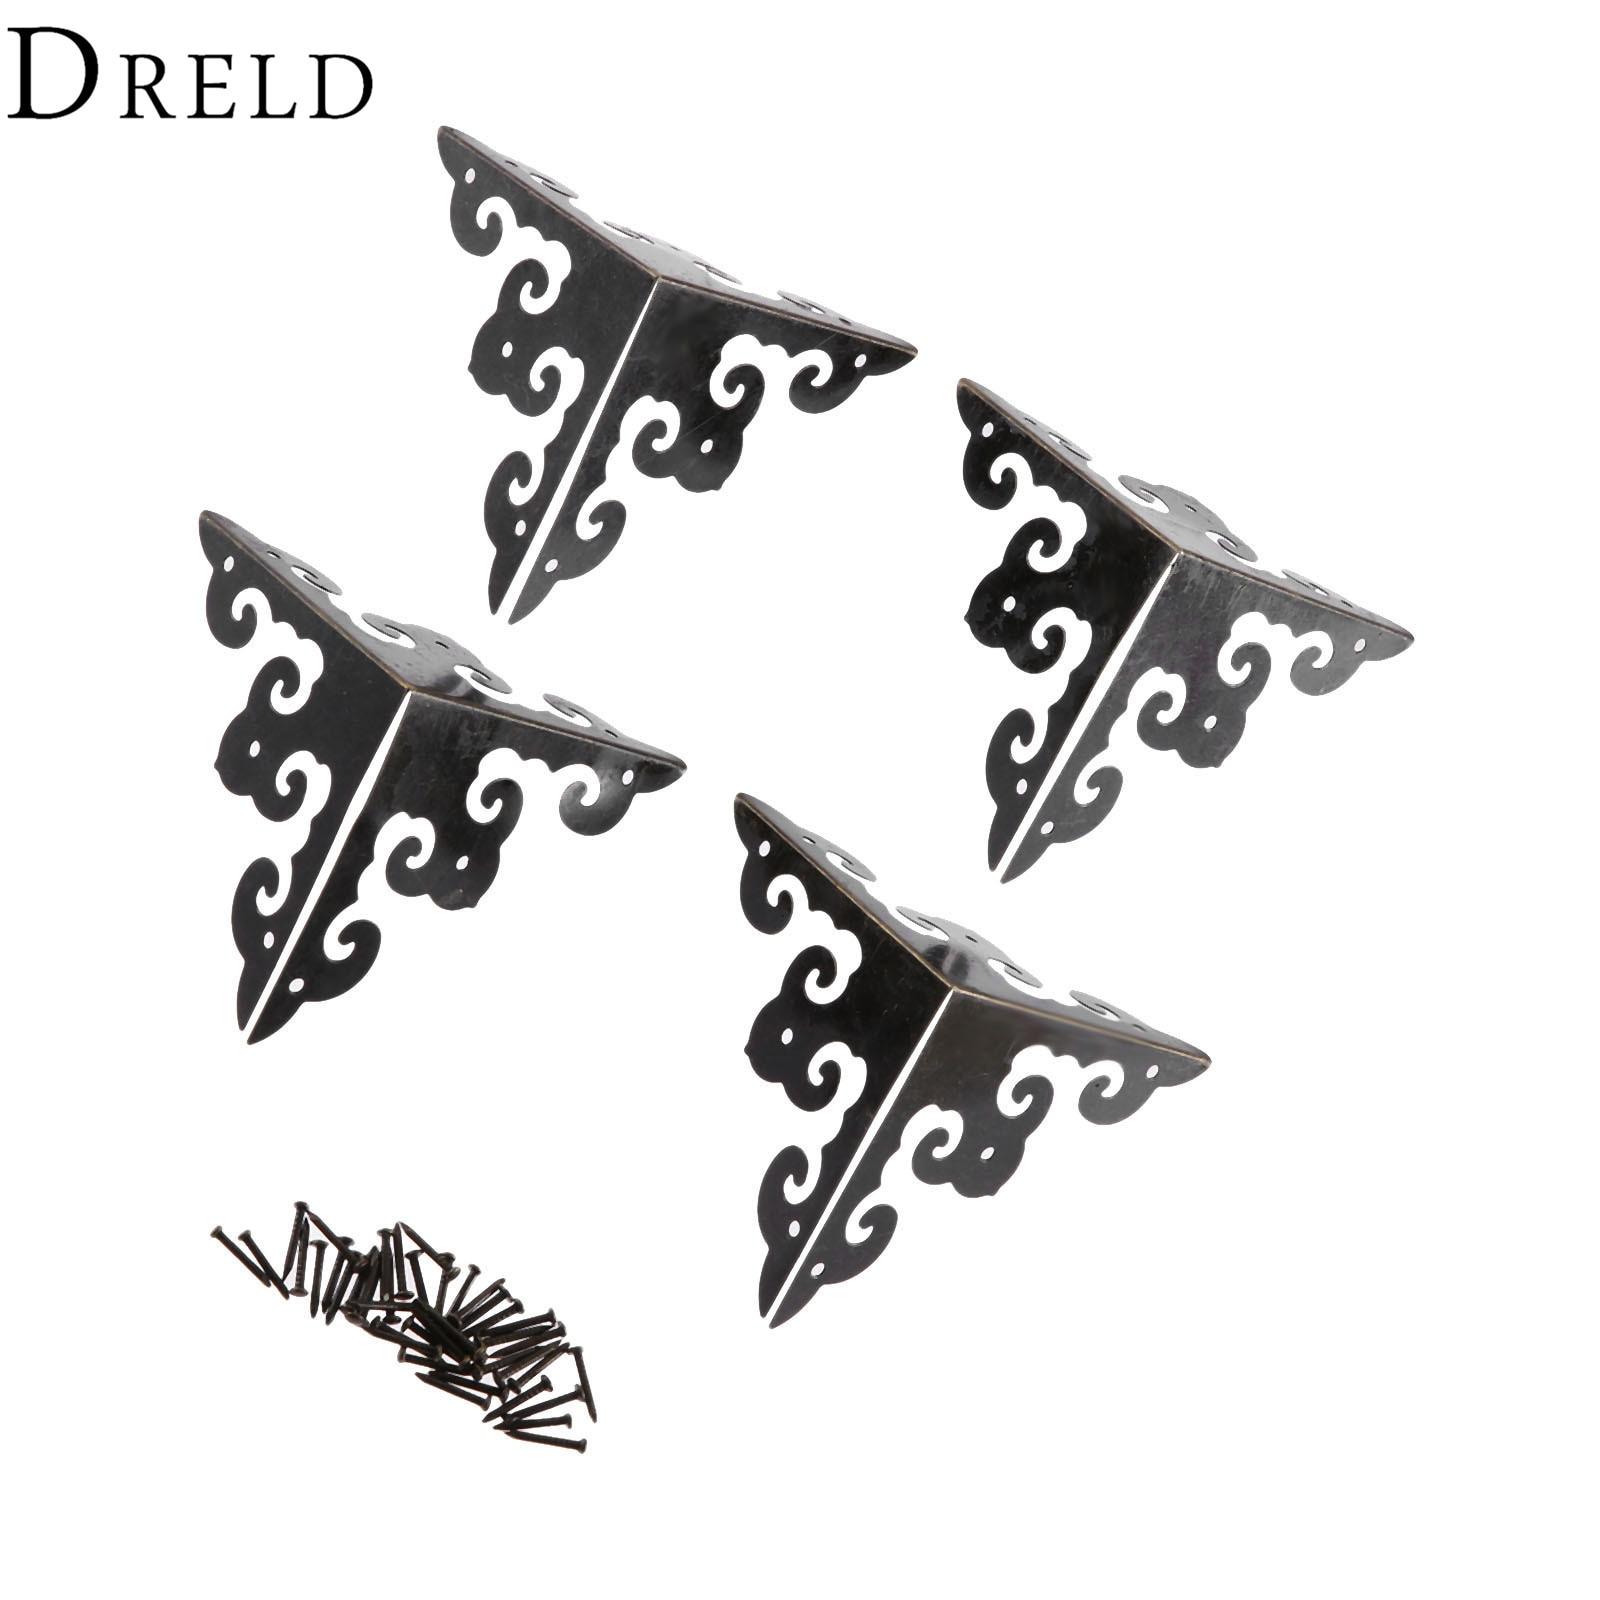 DRELD 4Pcs 50mm Antique Bronze Wood Box Feet Leg Corner Protector Guard Metal Crafts Decorative Bracket For Furniture Hardware